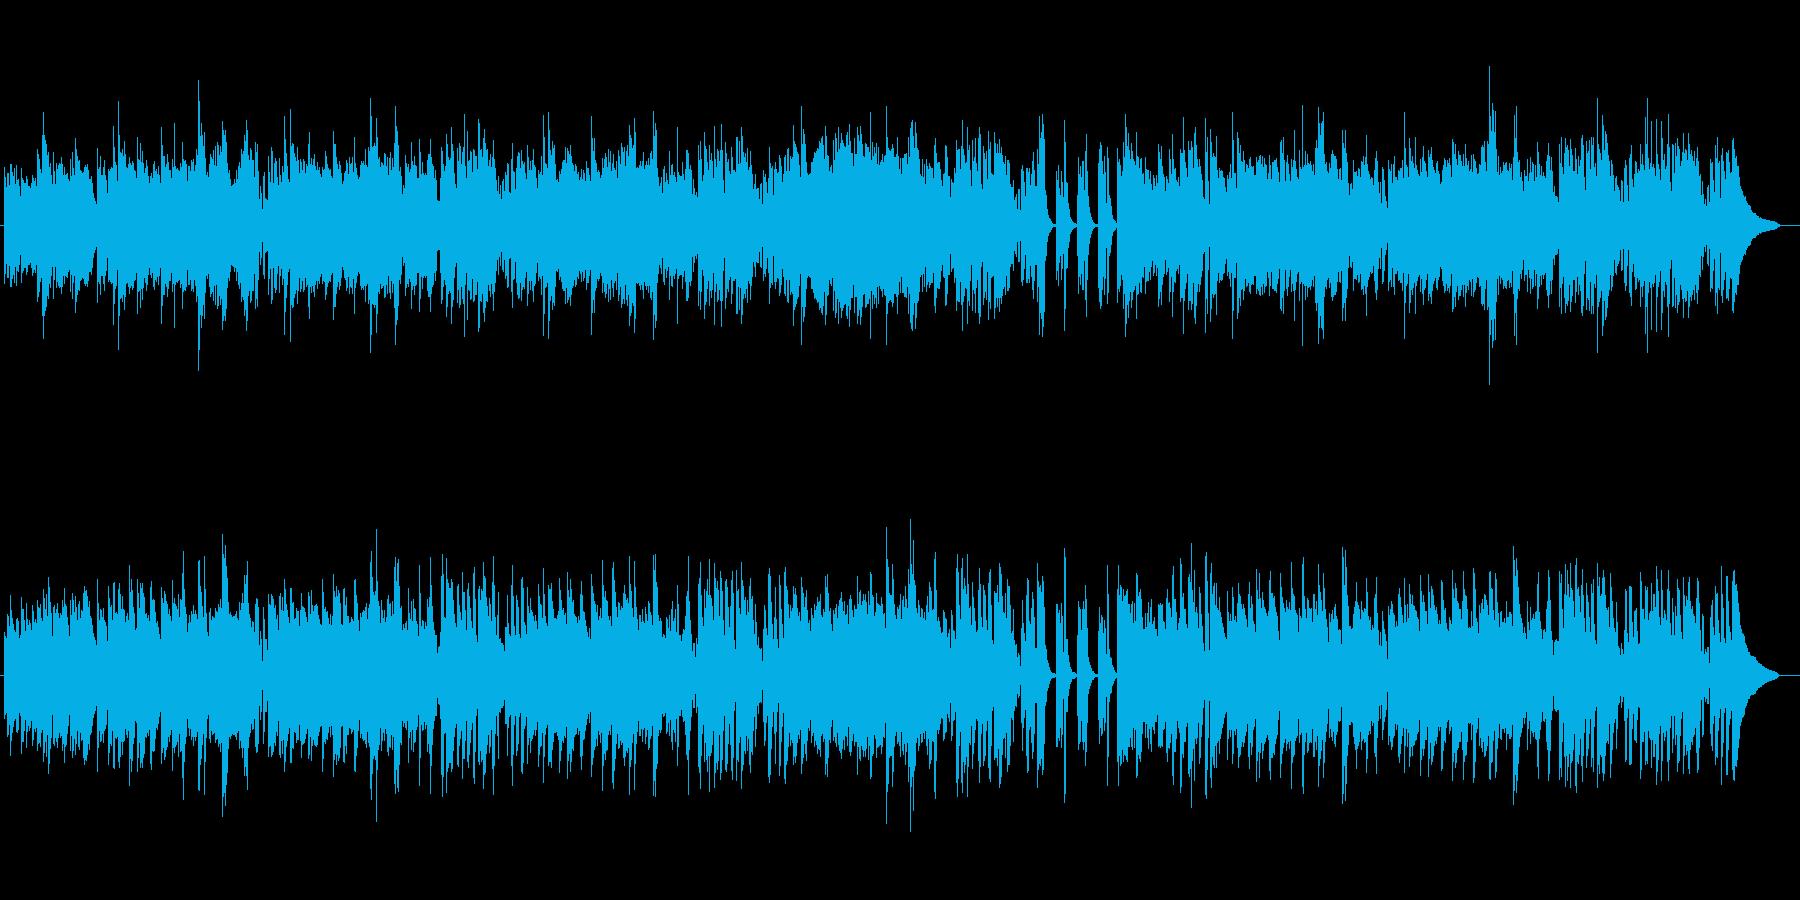 RPGフィールド曲風なオケ曲(ピアノ版)の再生済みの波形